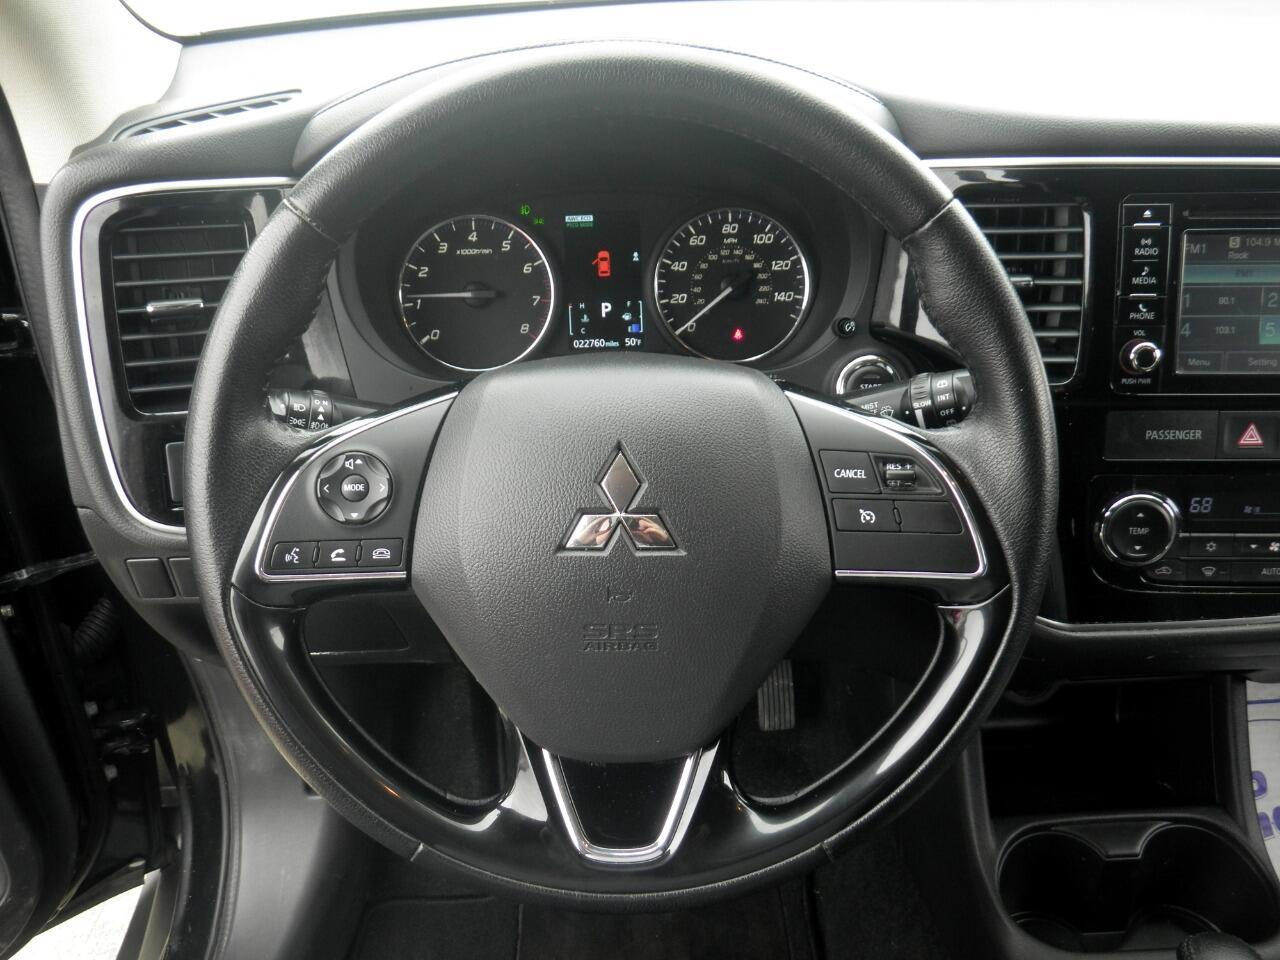 2016 Mitsubishi Outlander AWC 4dr SE